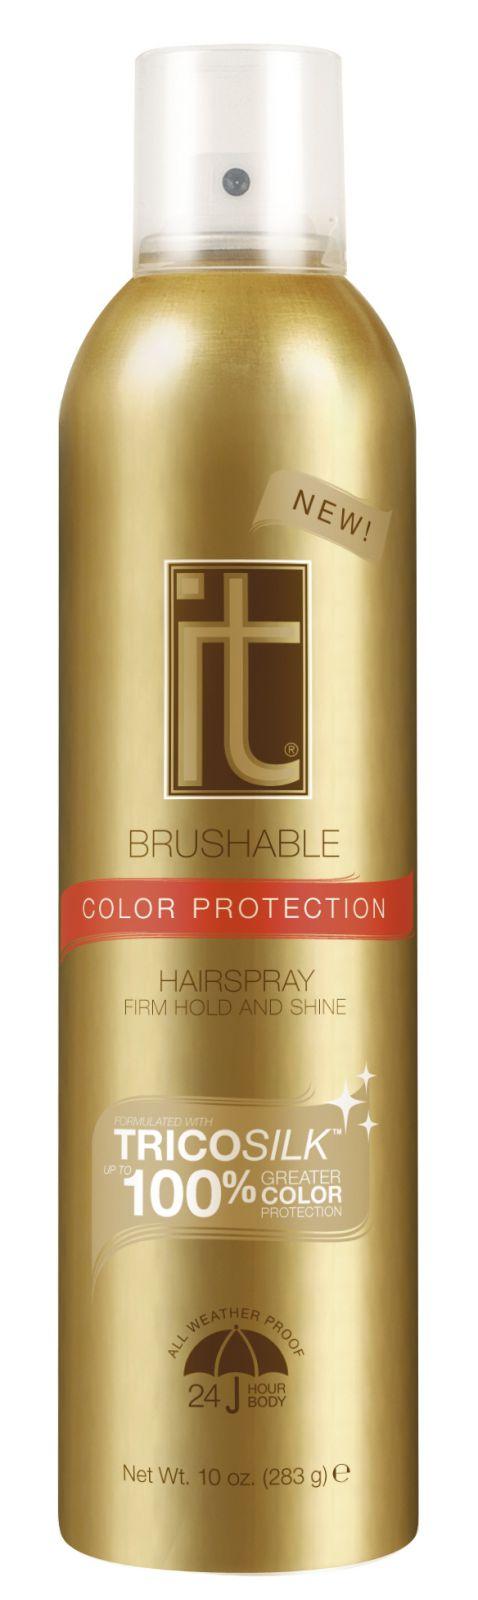 Freeze it Color Protection Hair Spray 24 Hour Hold 283 ml - lak na vlasy - Lak pro ochranu barvy vlasů.